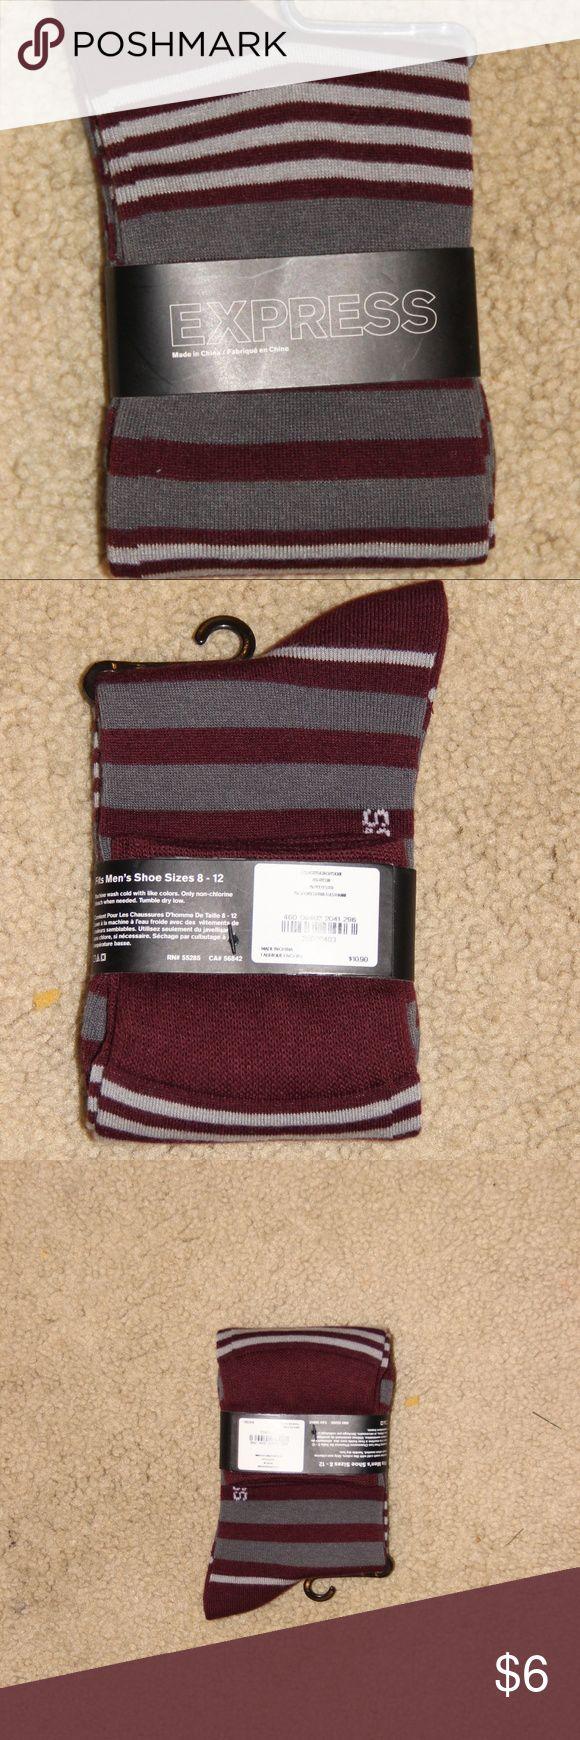 Express Dress Socks Men's Socks. New. Shoe Size 8-12 Express Underwear & Socks Dress Socks